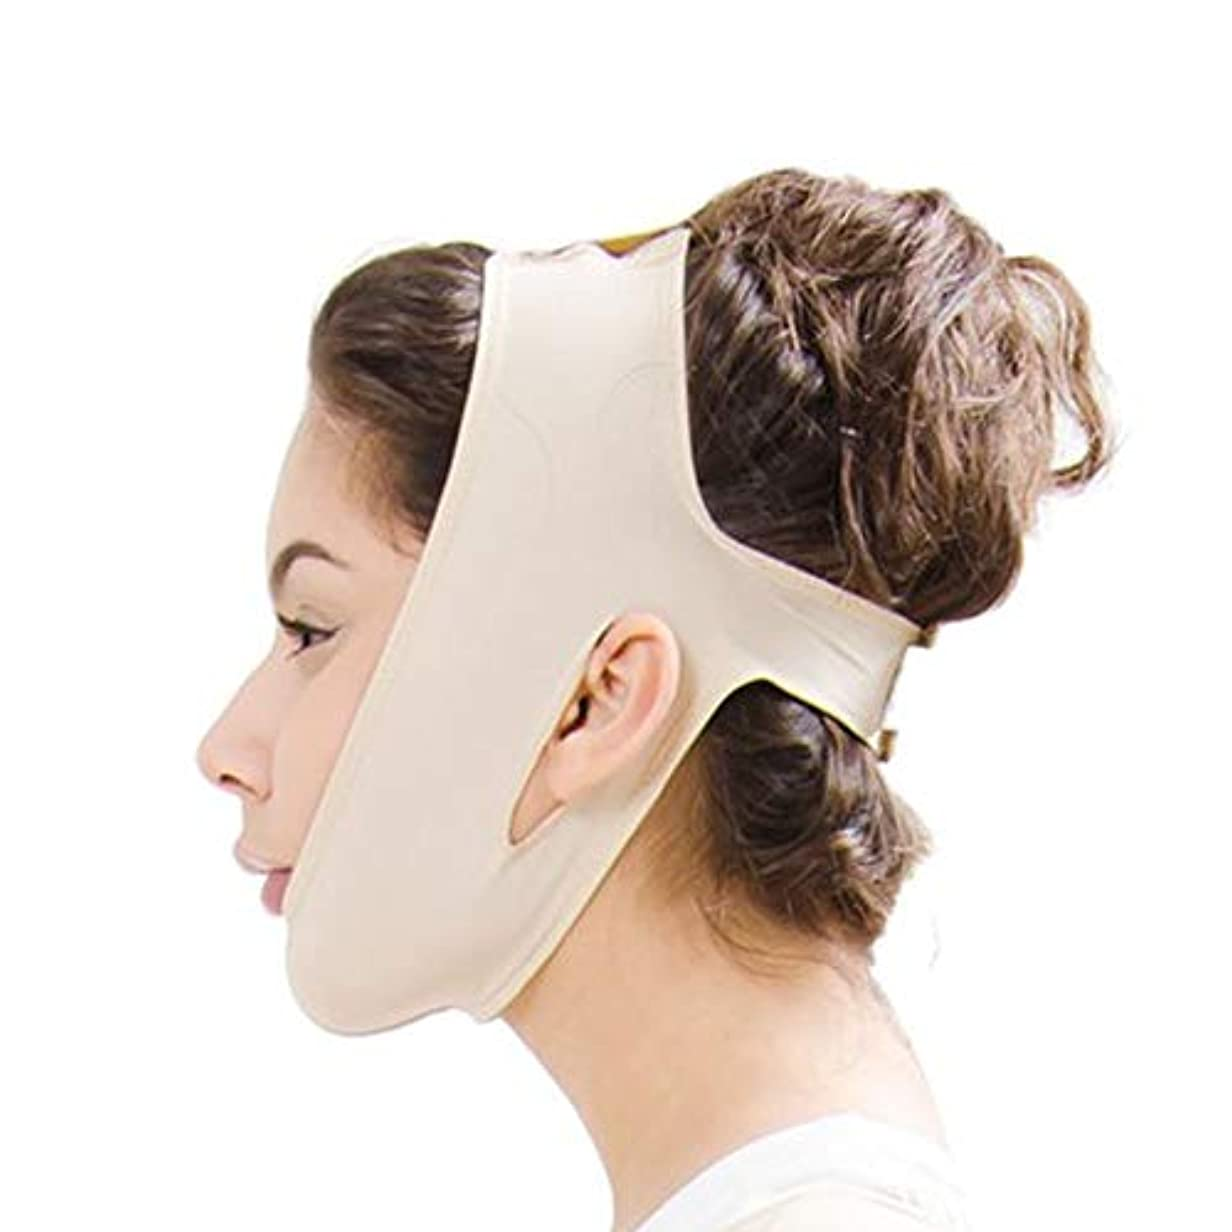 GLJJQMY フェイシャルリフティングマスクフェイシャルダブルチンコンプレッションV字型フェイスブレスレットヘッドギアリフティングファーミングスキン 顔用整形マスク (Size : XL)